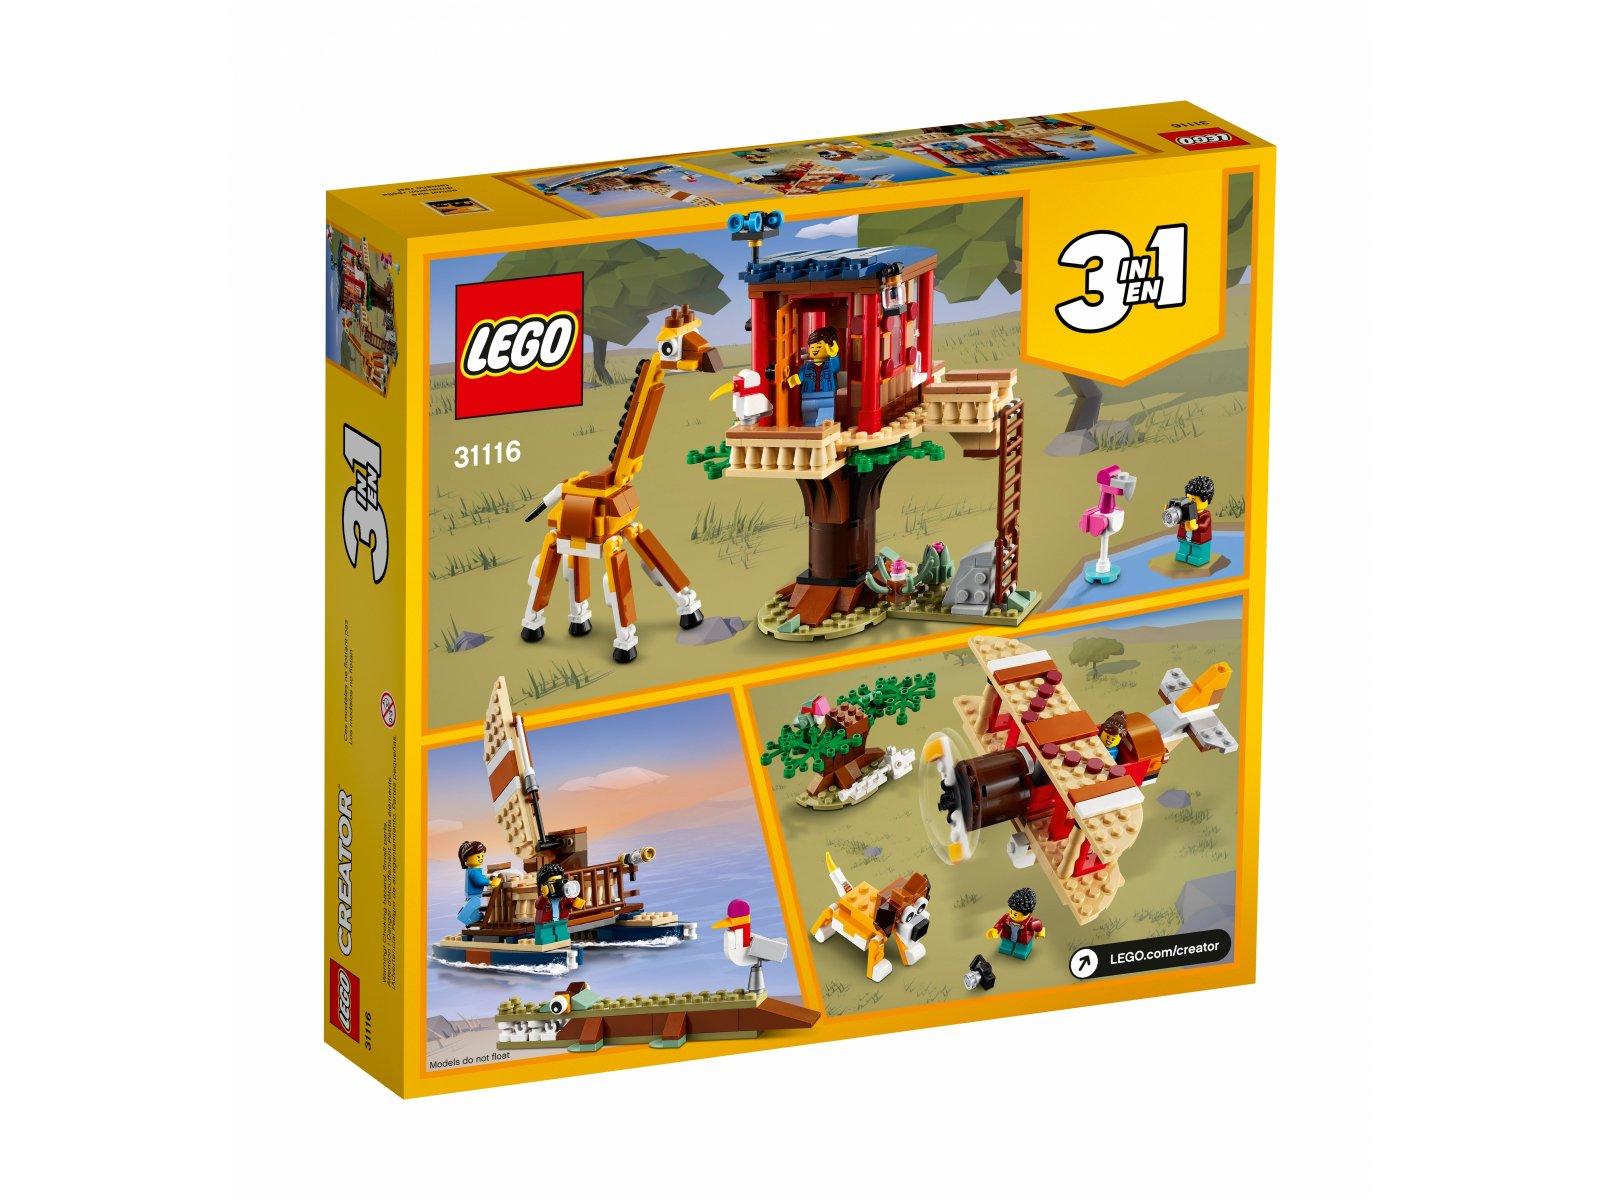 LEGO Creator 3 w 1 31116 Domek na drzewie na safari